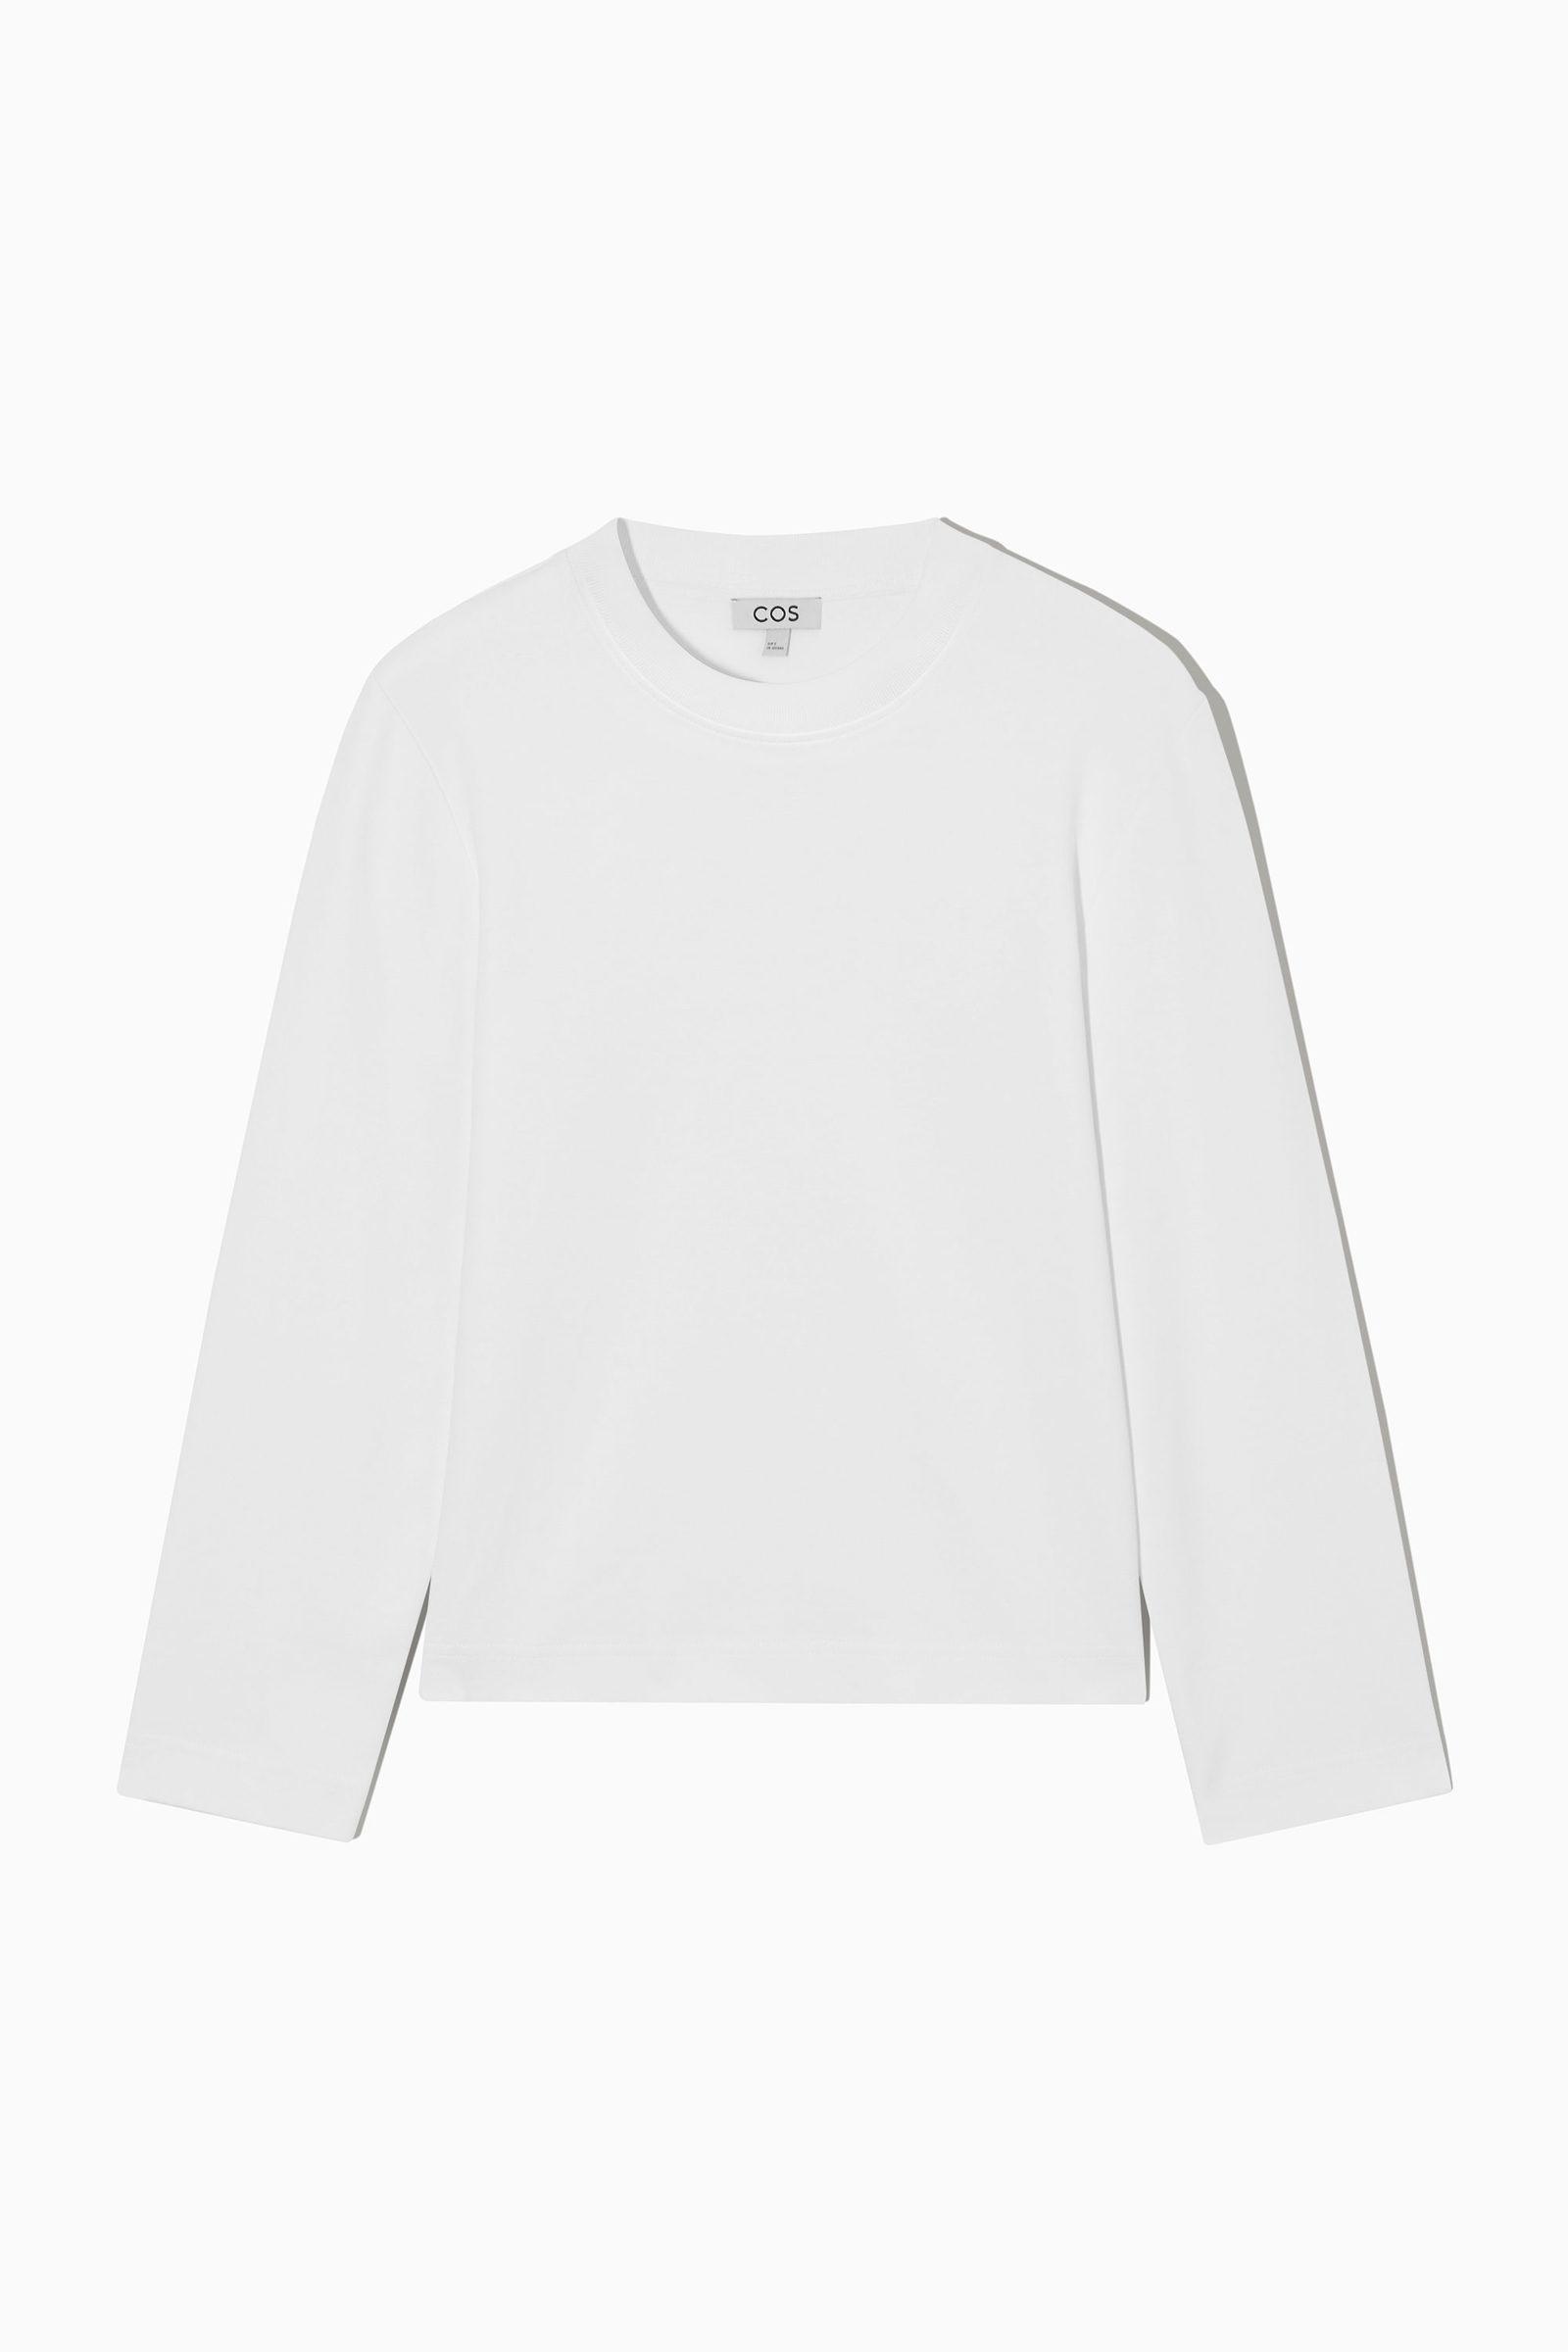 COS 슬림 핏 롱 슬리브 티셔츠 의 화이트컬러 Product입니다.